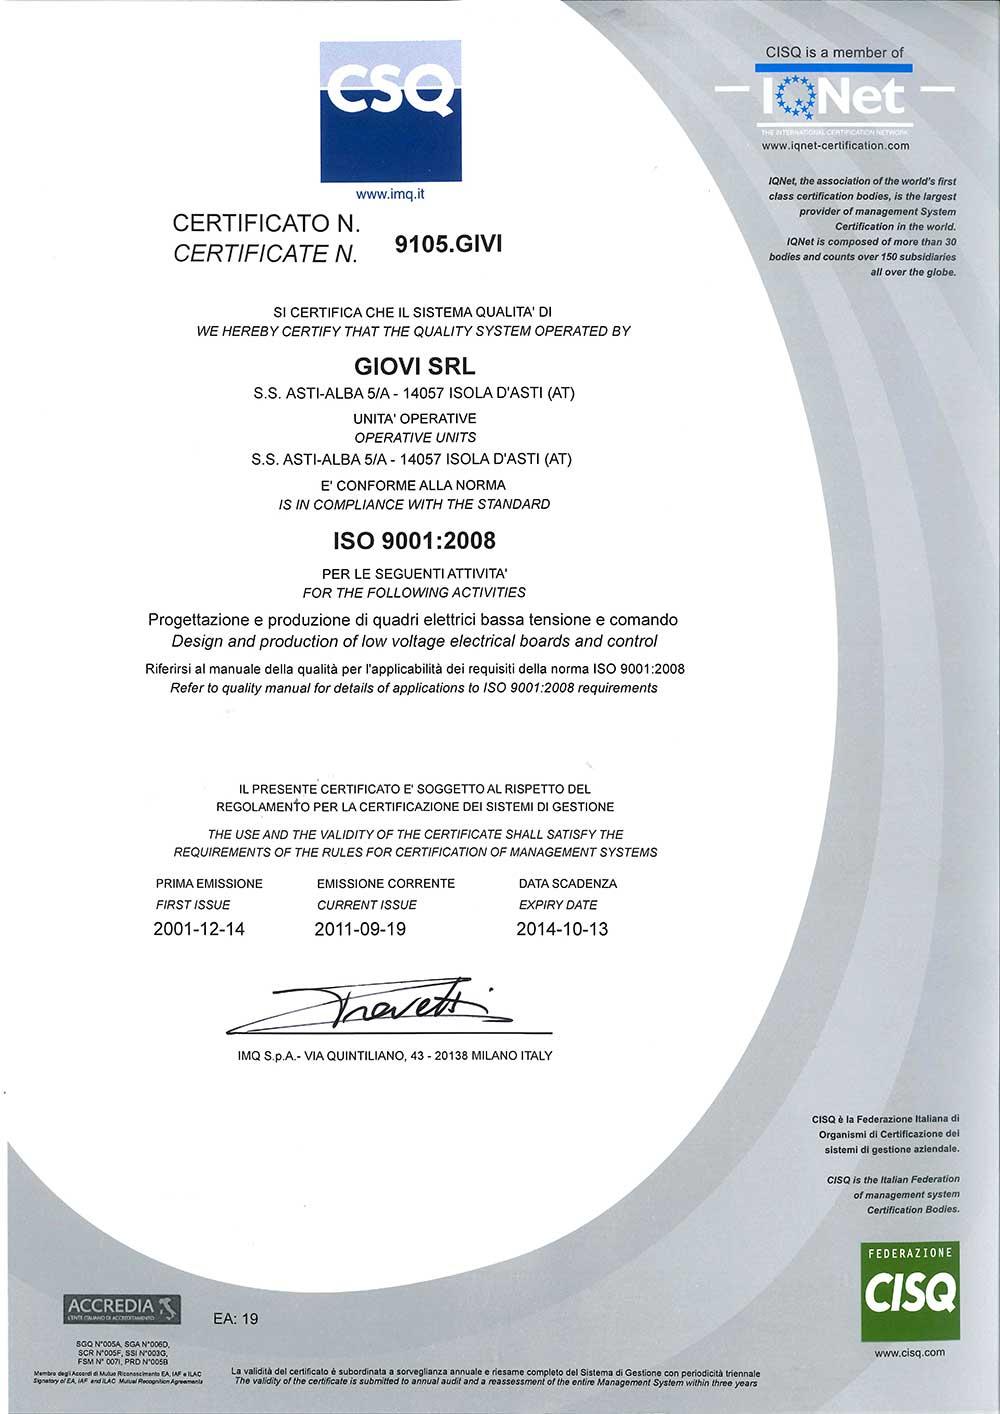 Giovi srl - Certified company - csq